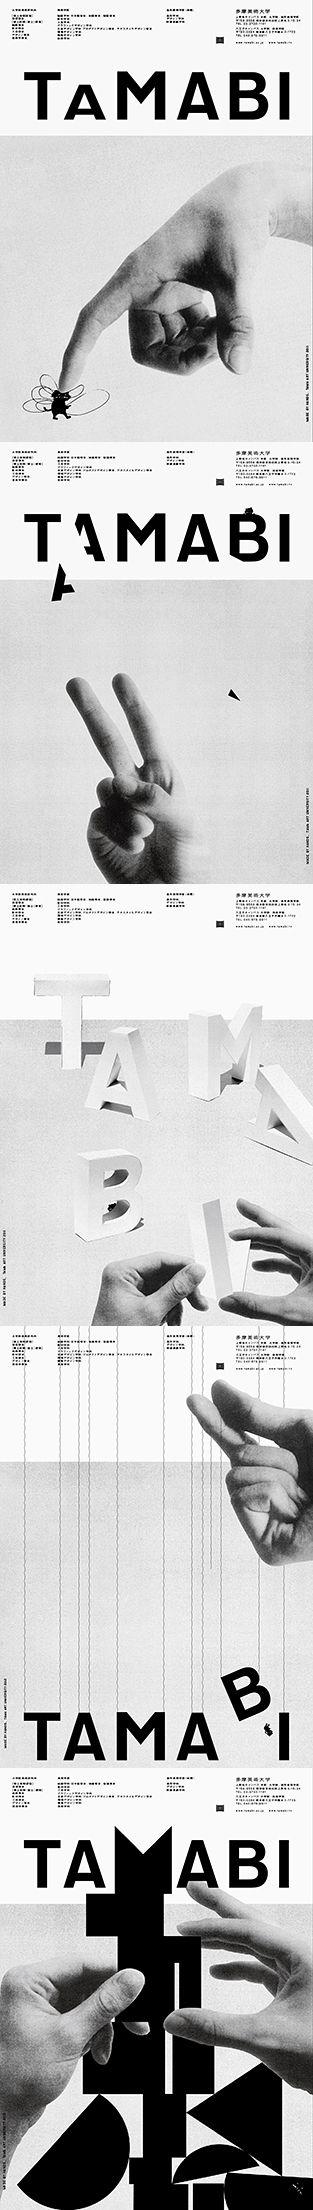 TAMABI 「MADE BY HANDS」